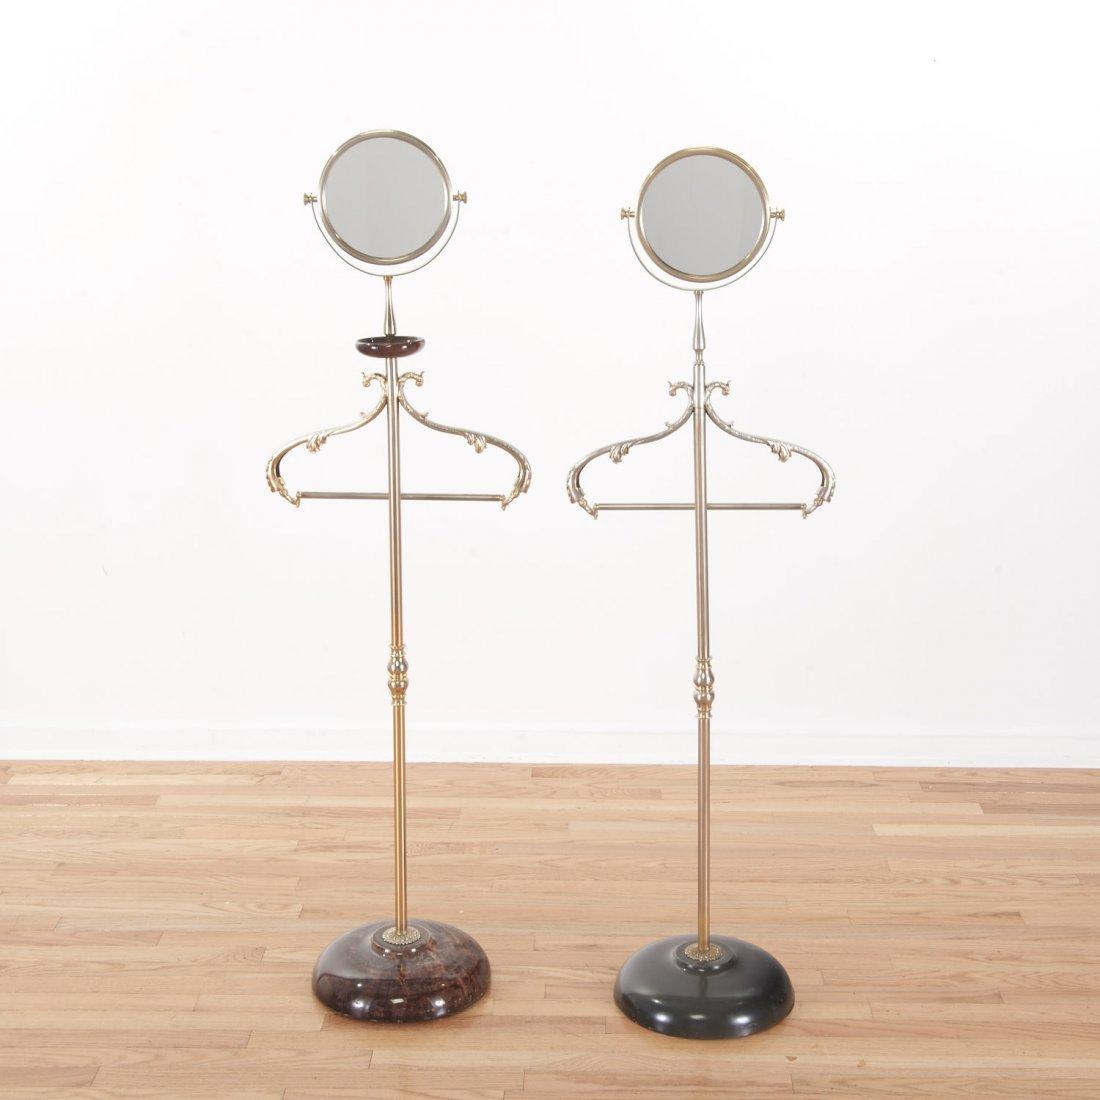 Aldo Tura lacquer, parchment valet/vanity stands - 7